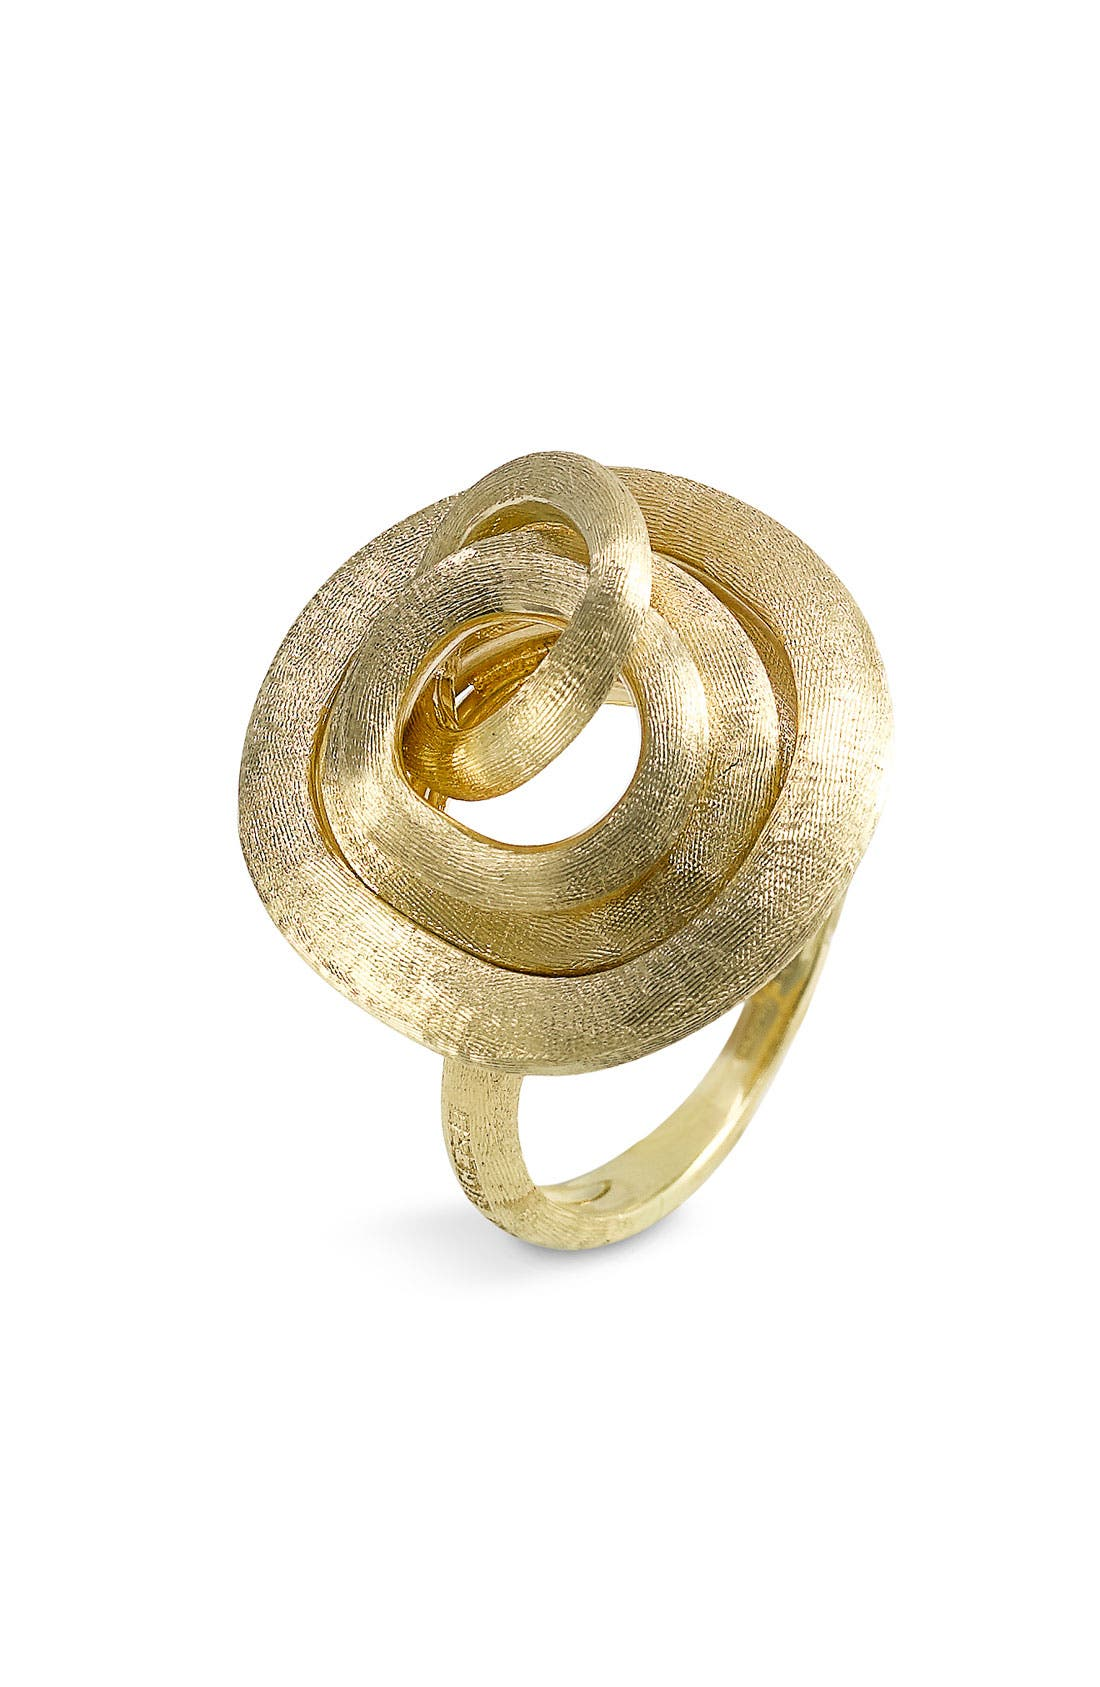 Main Image - Marco Bicego 'Jaipur Link' Large Cluster Ring